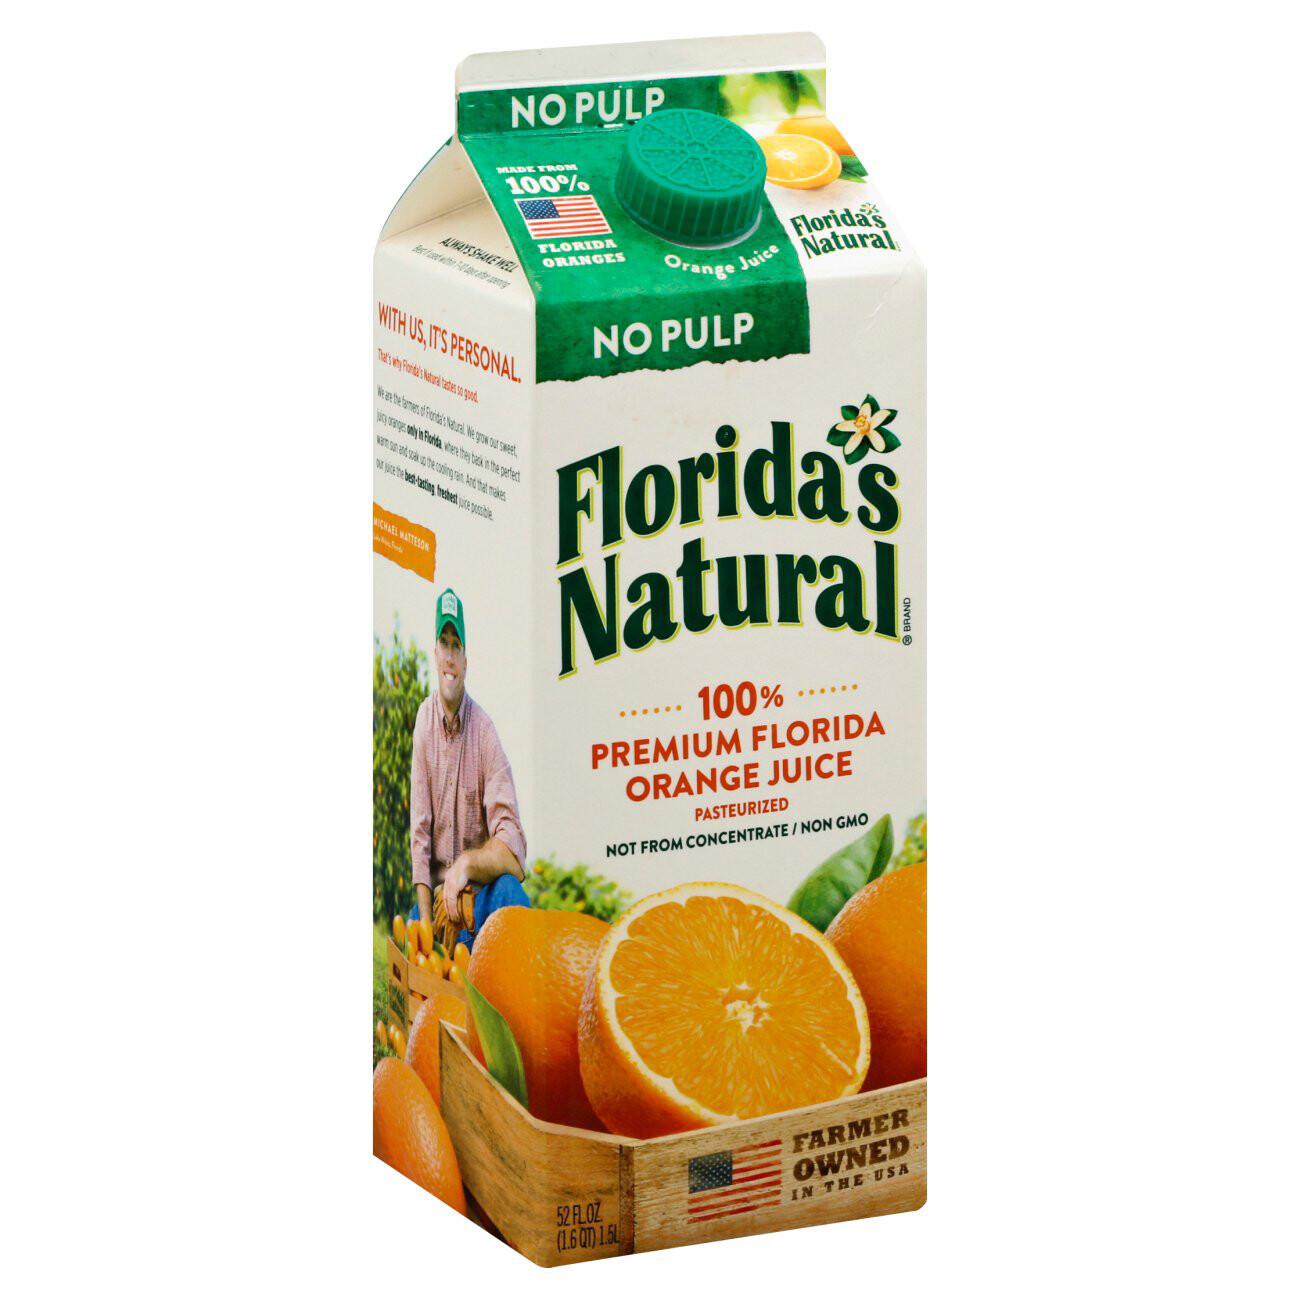 FLORIDAS NATURAL ORANGE JUICE NO PULP 1.53L